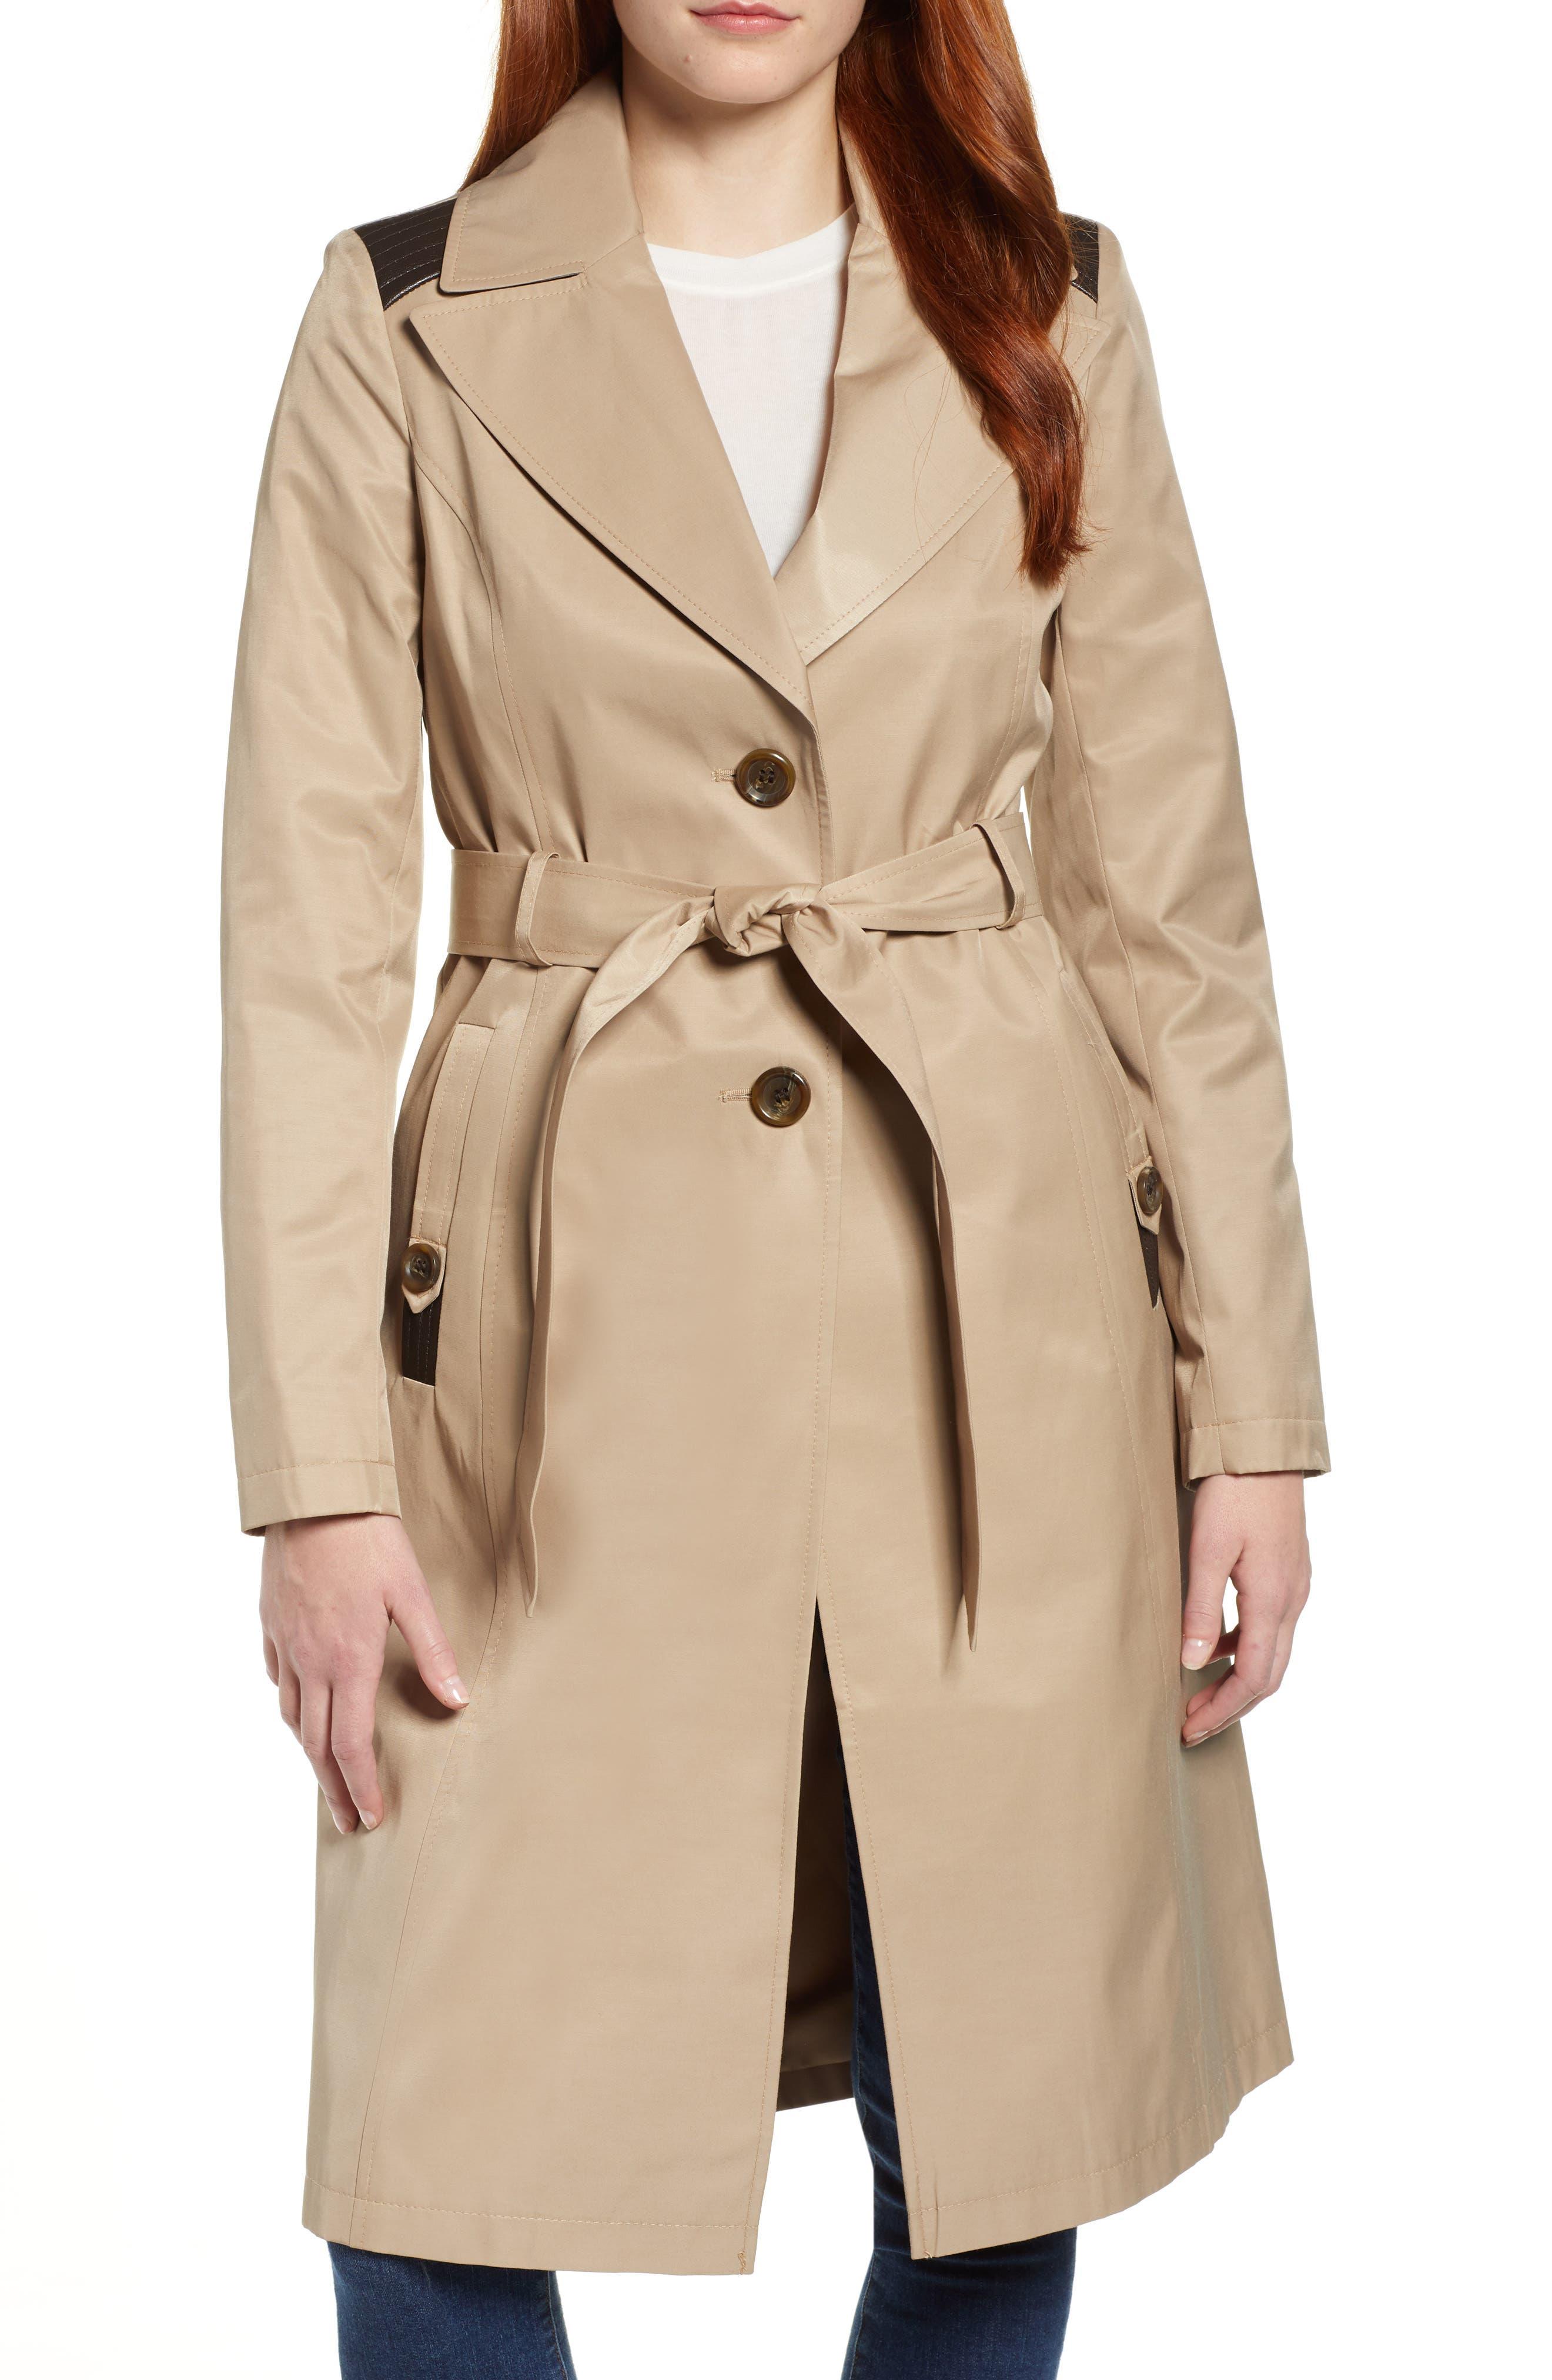 1940s Coats & Jackets Fashion History Womens Via Spiga Faux Leather Trim Trench Coat Size X-Large - Beige $119.90 AT vintagedancer.com